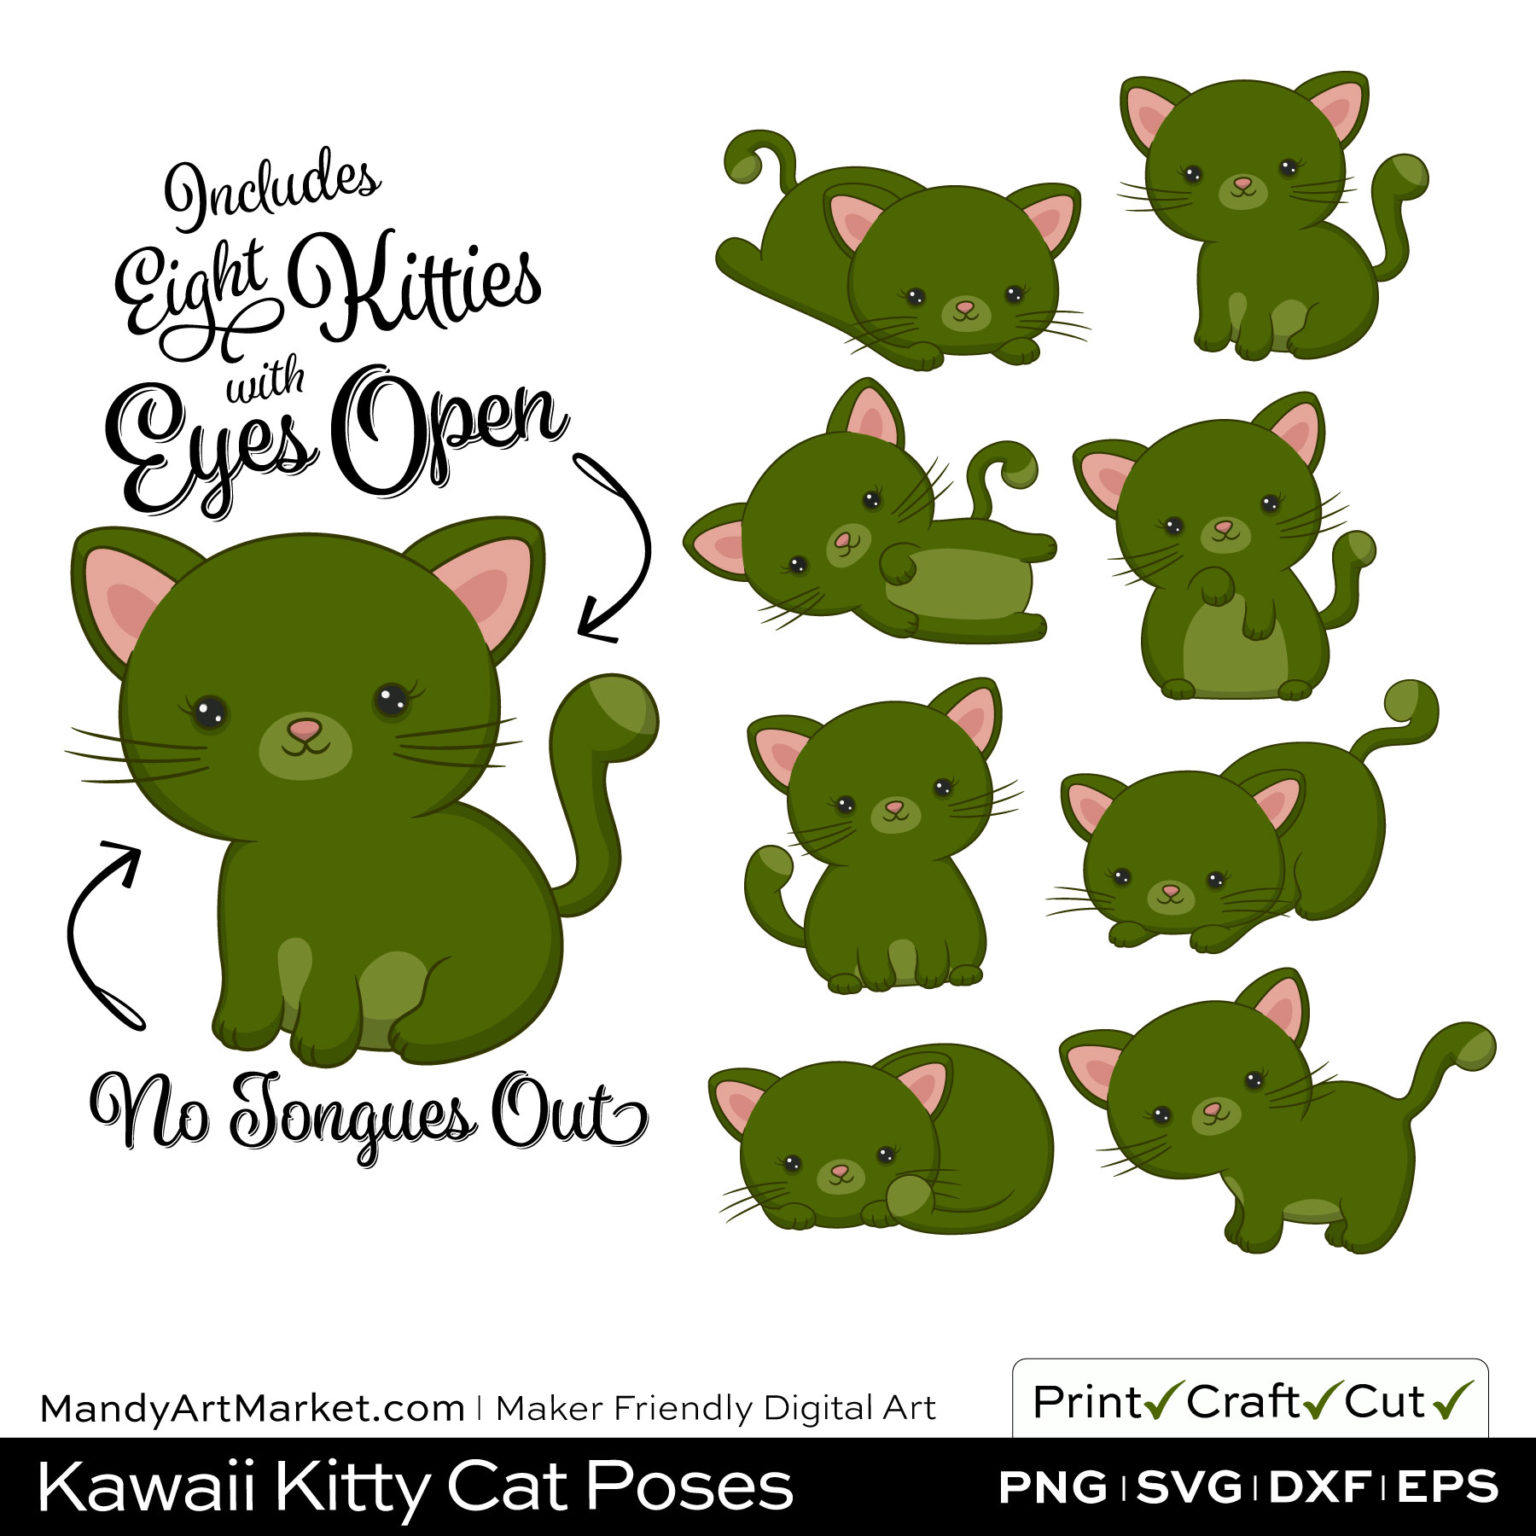 Dark Moss Green Kawaii Kitty Cat Poses Clipart on Wood Background